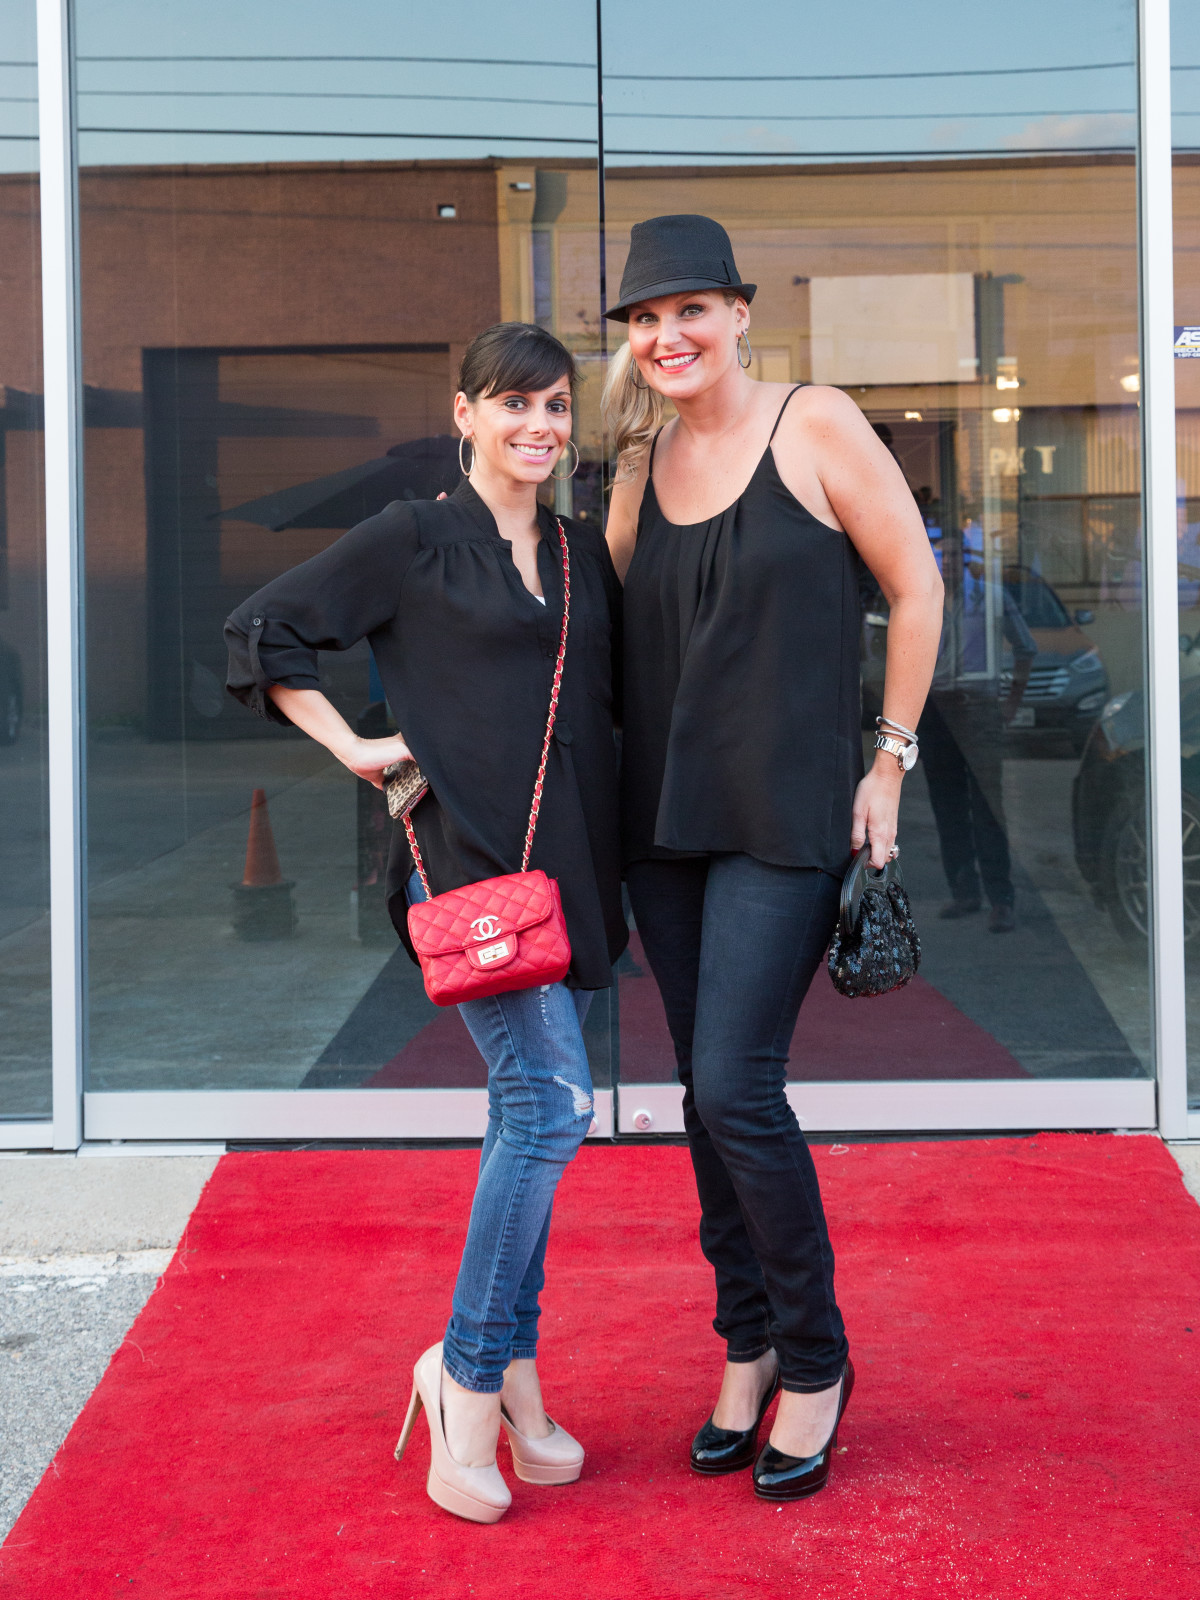 Lauren Ives, Jessica Pantano